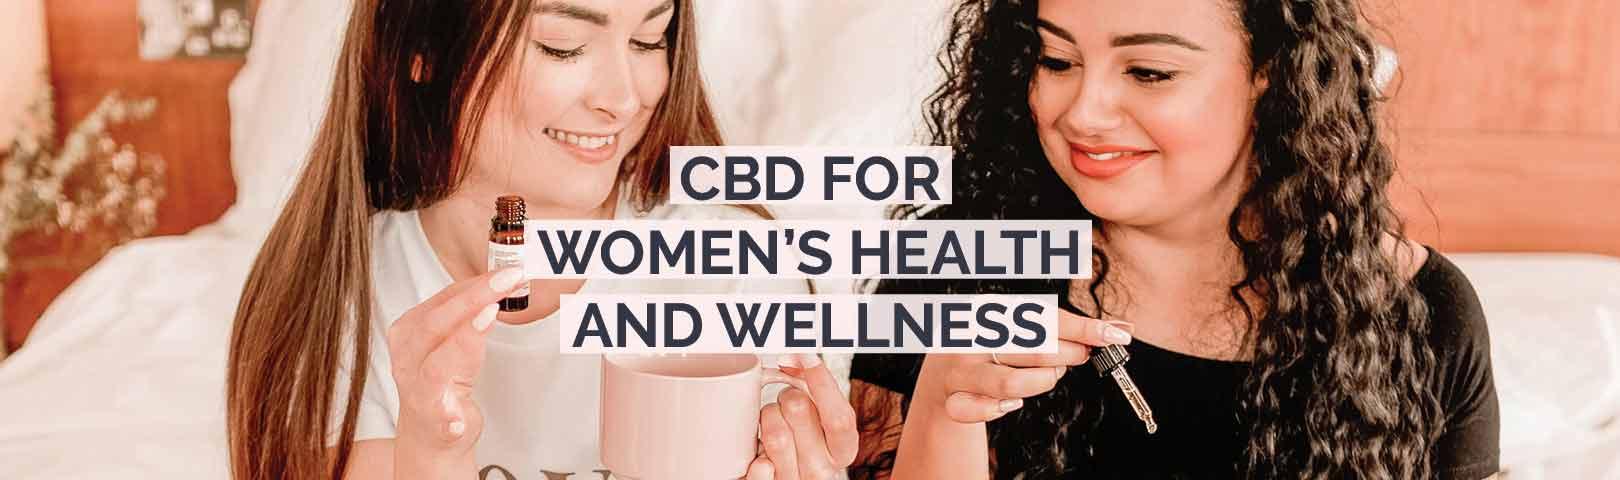 cbd for womens health and wellness